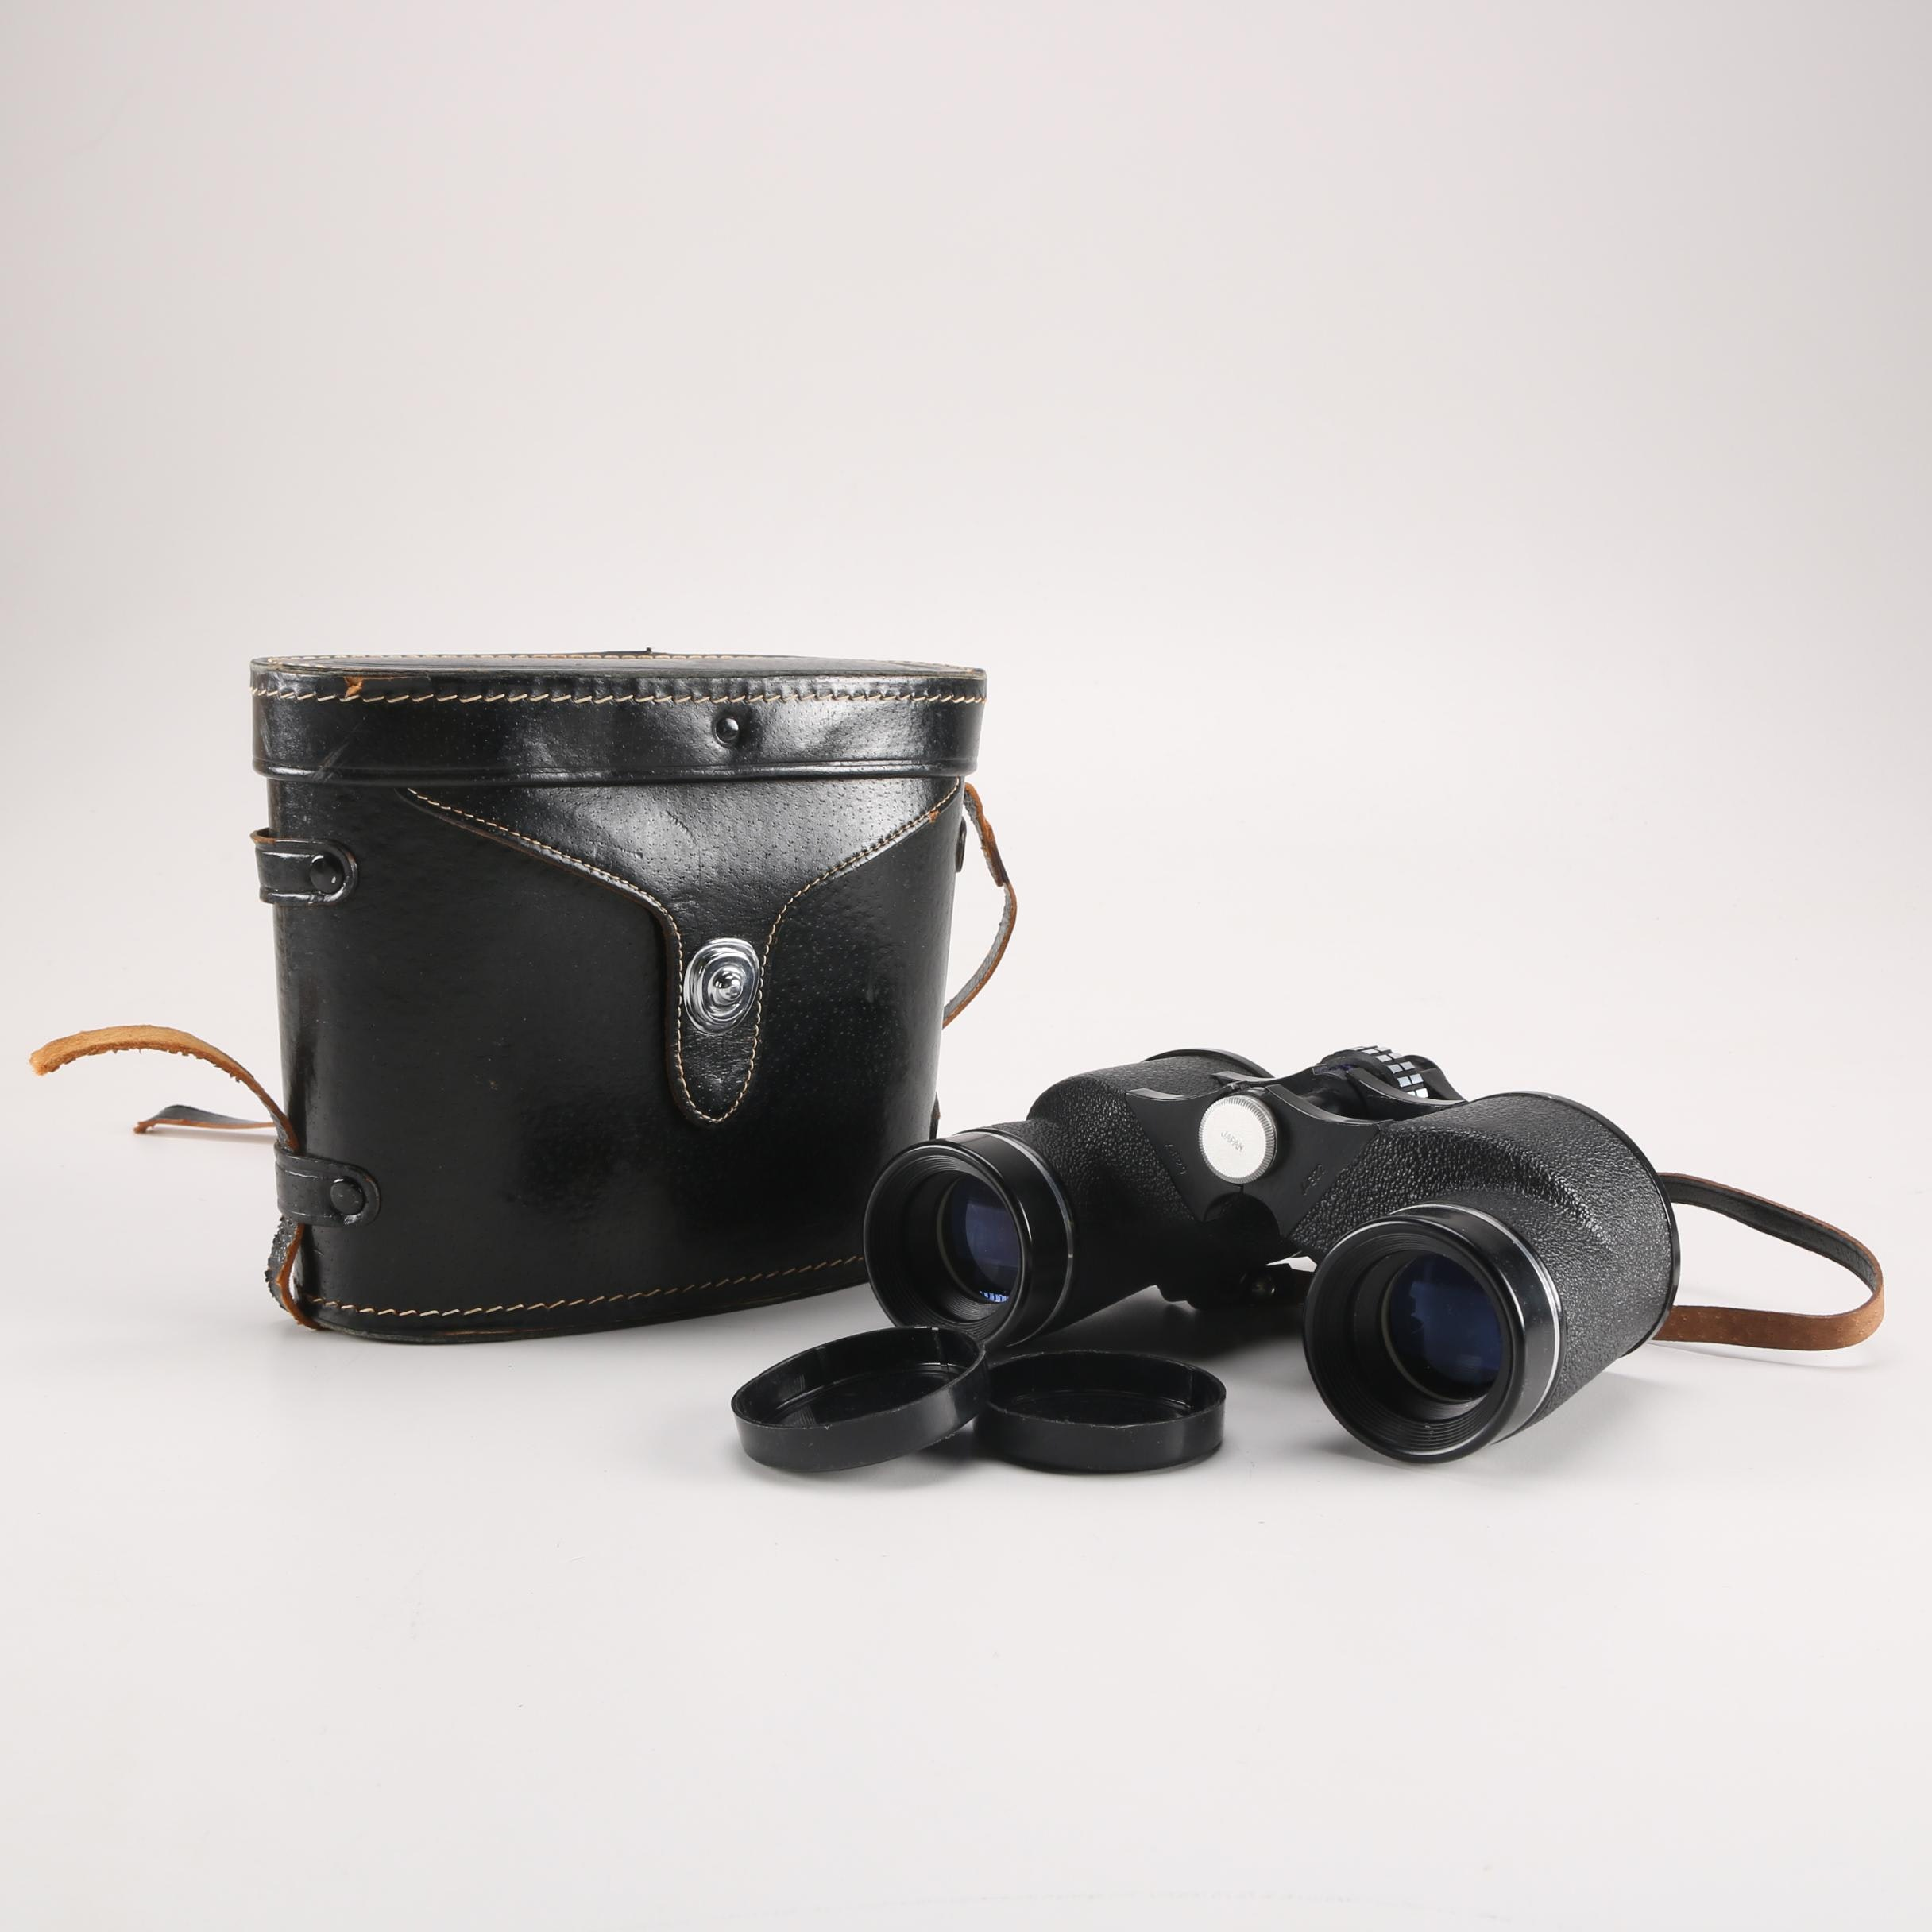 Tasco Adjustible Magnification Binoculars